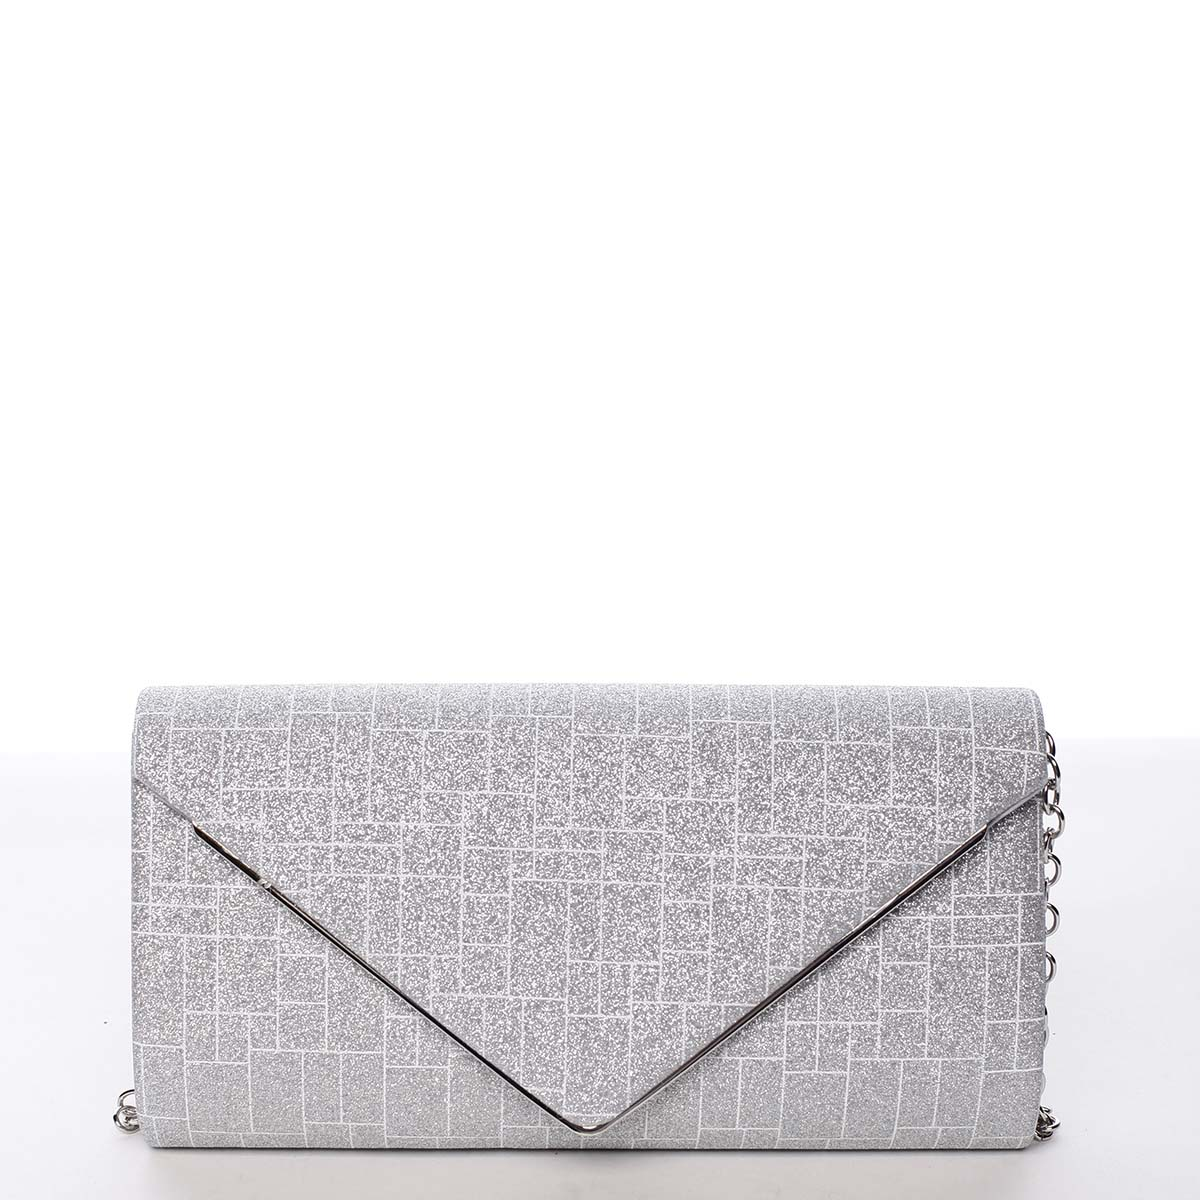 Elegantná dámska listová kabelka strieborná - Michelle Moon HightWay strieborná